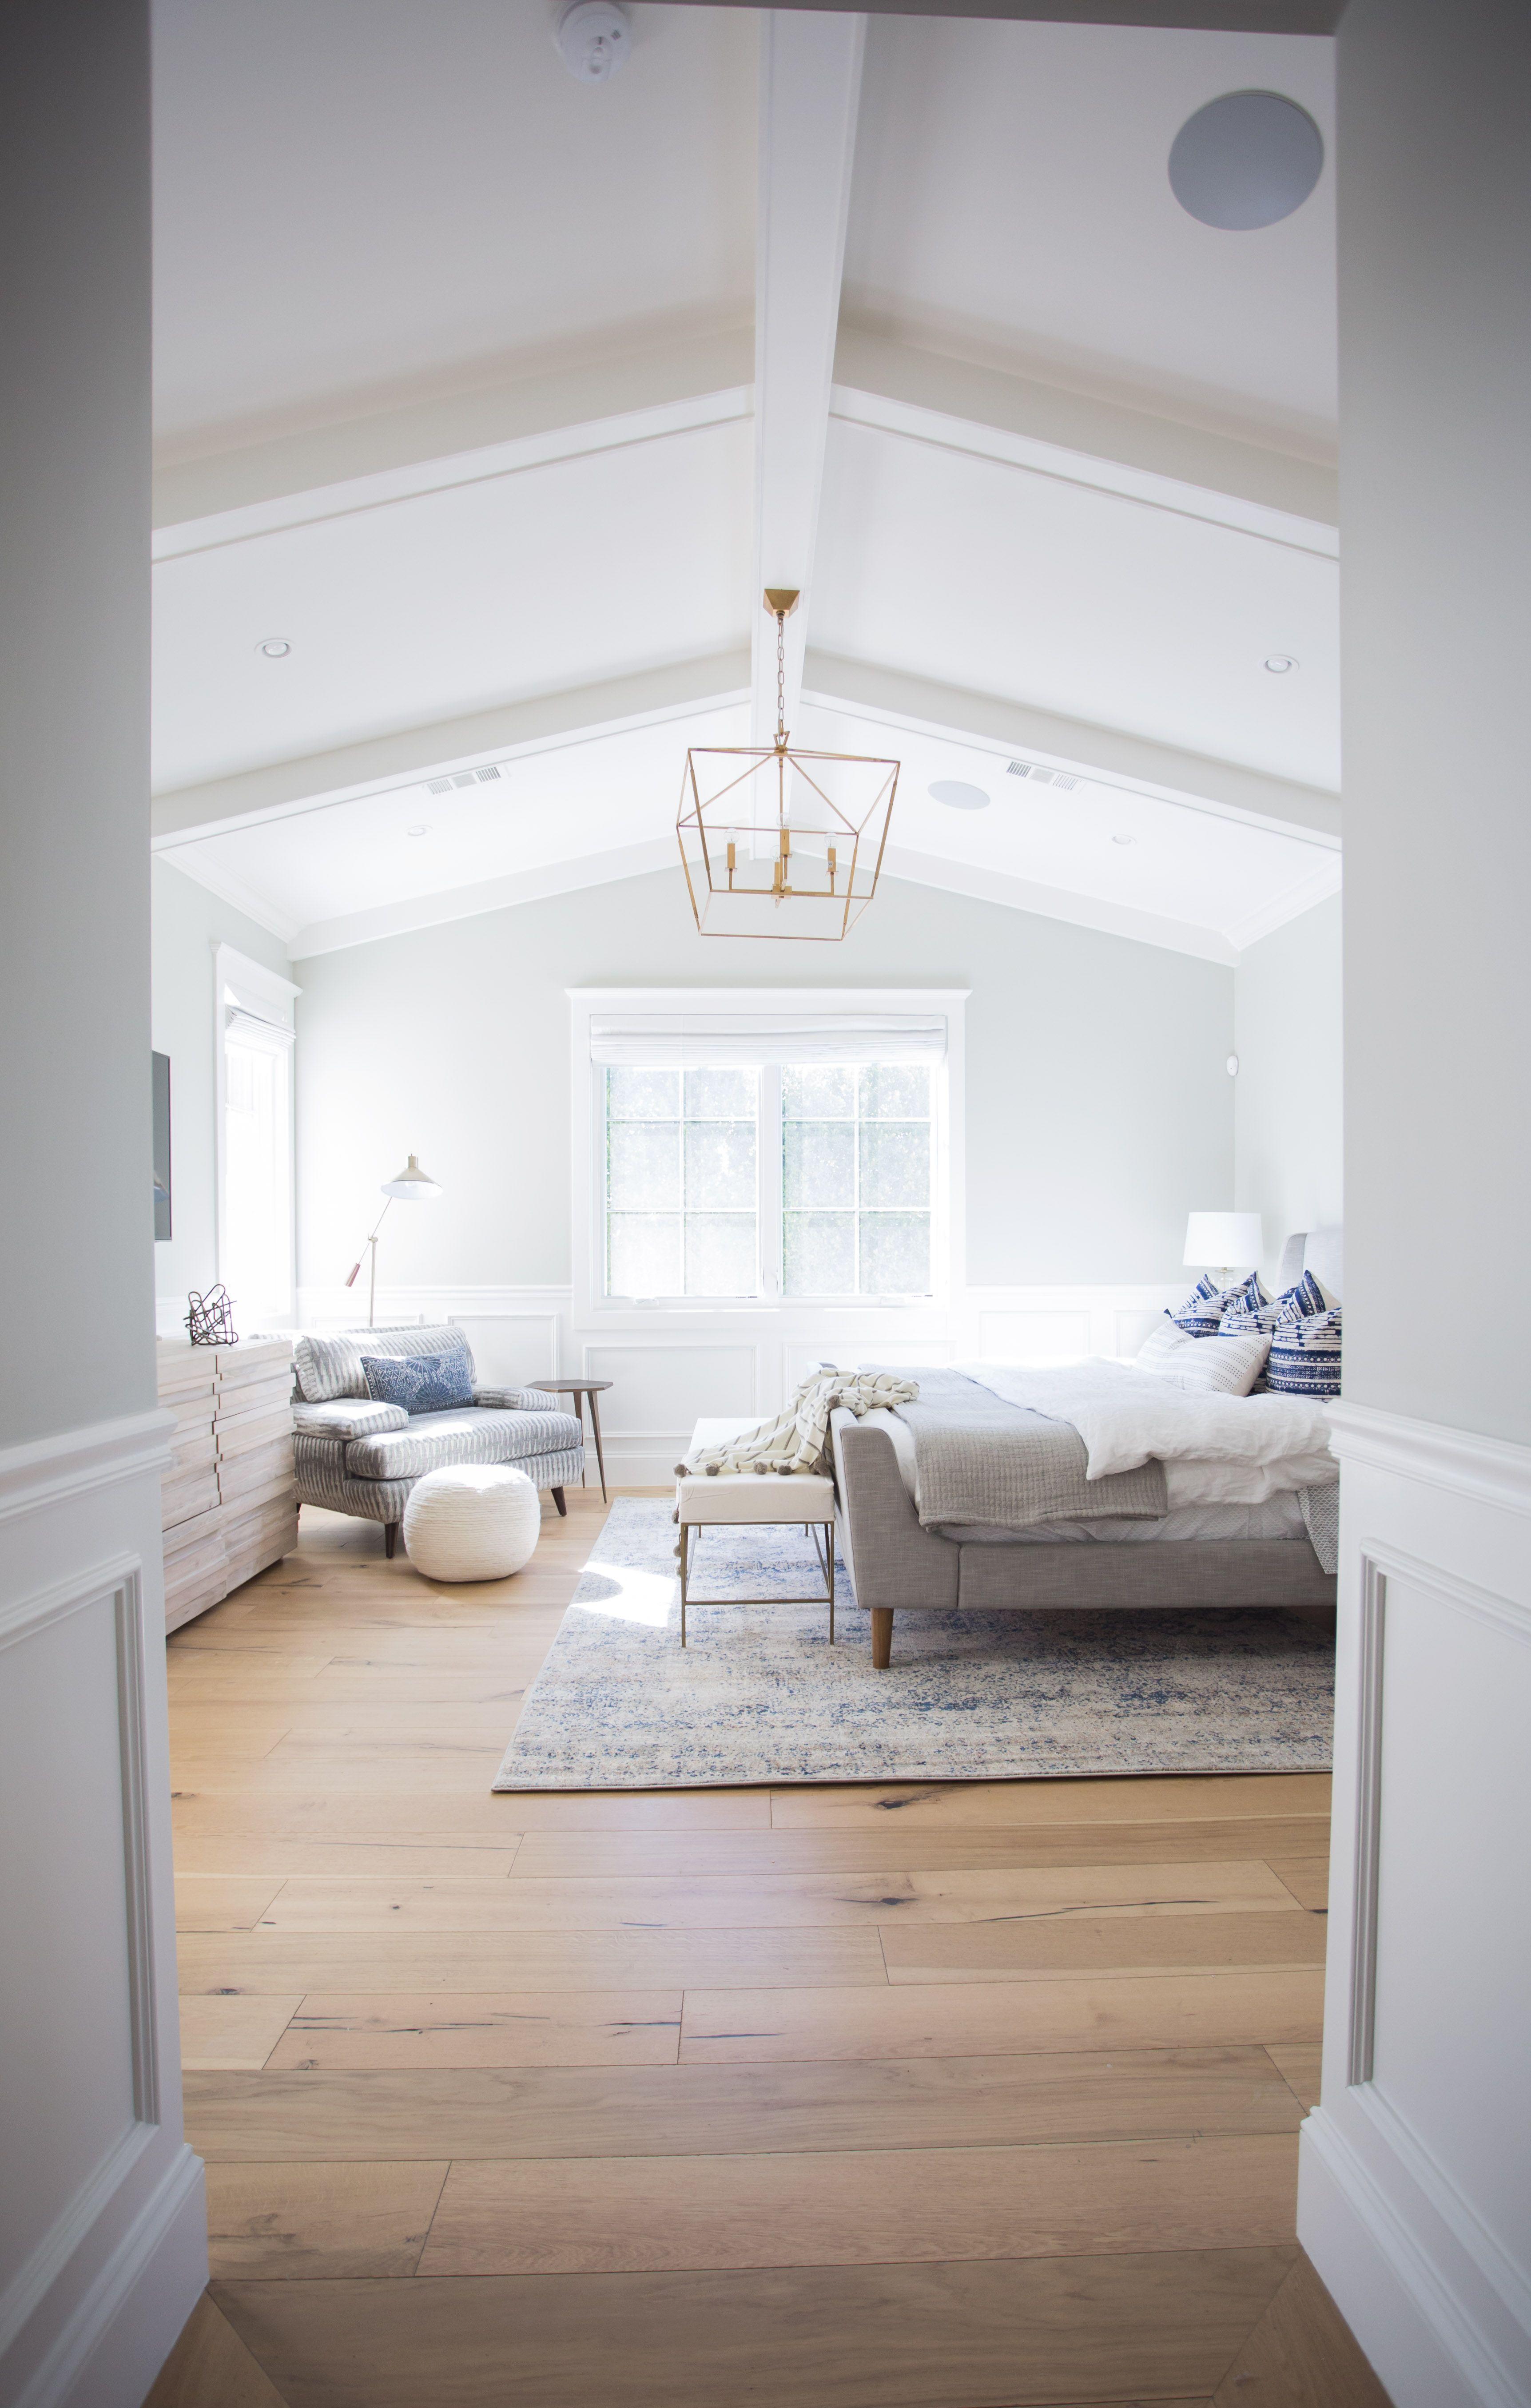 Vaulted Ceiling Master Bedroom Brass Chandelier Board And Batten Modern Transit Vaulted Ceiling Bedroom Master Bedroom Chandelier Master Bedroom Addition